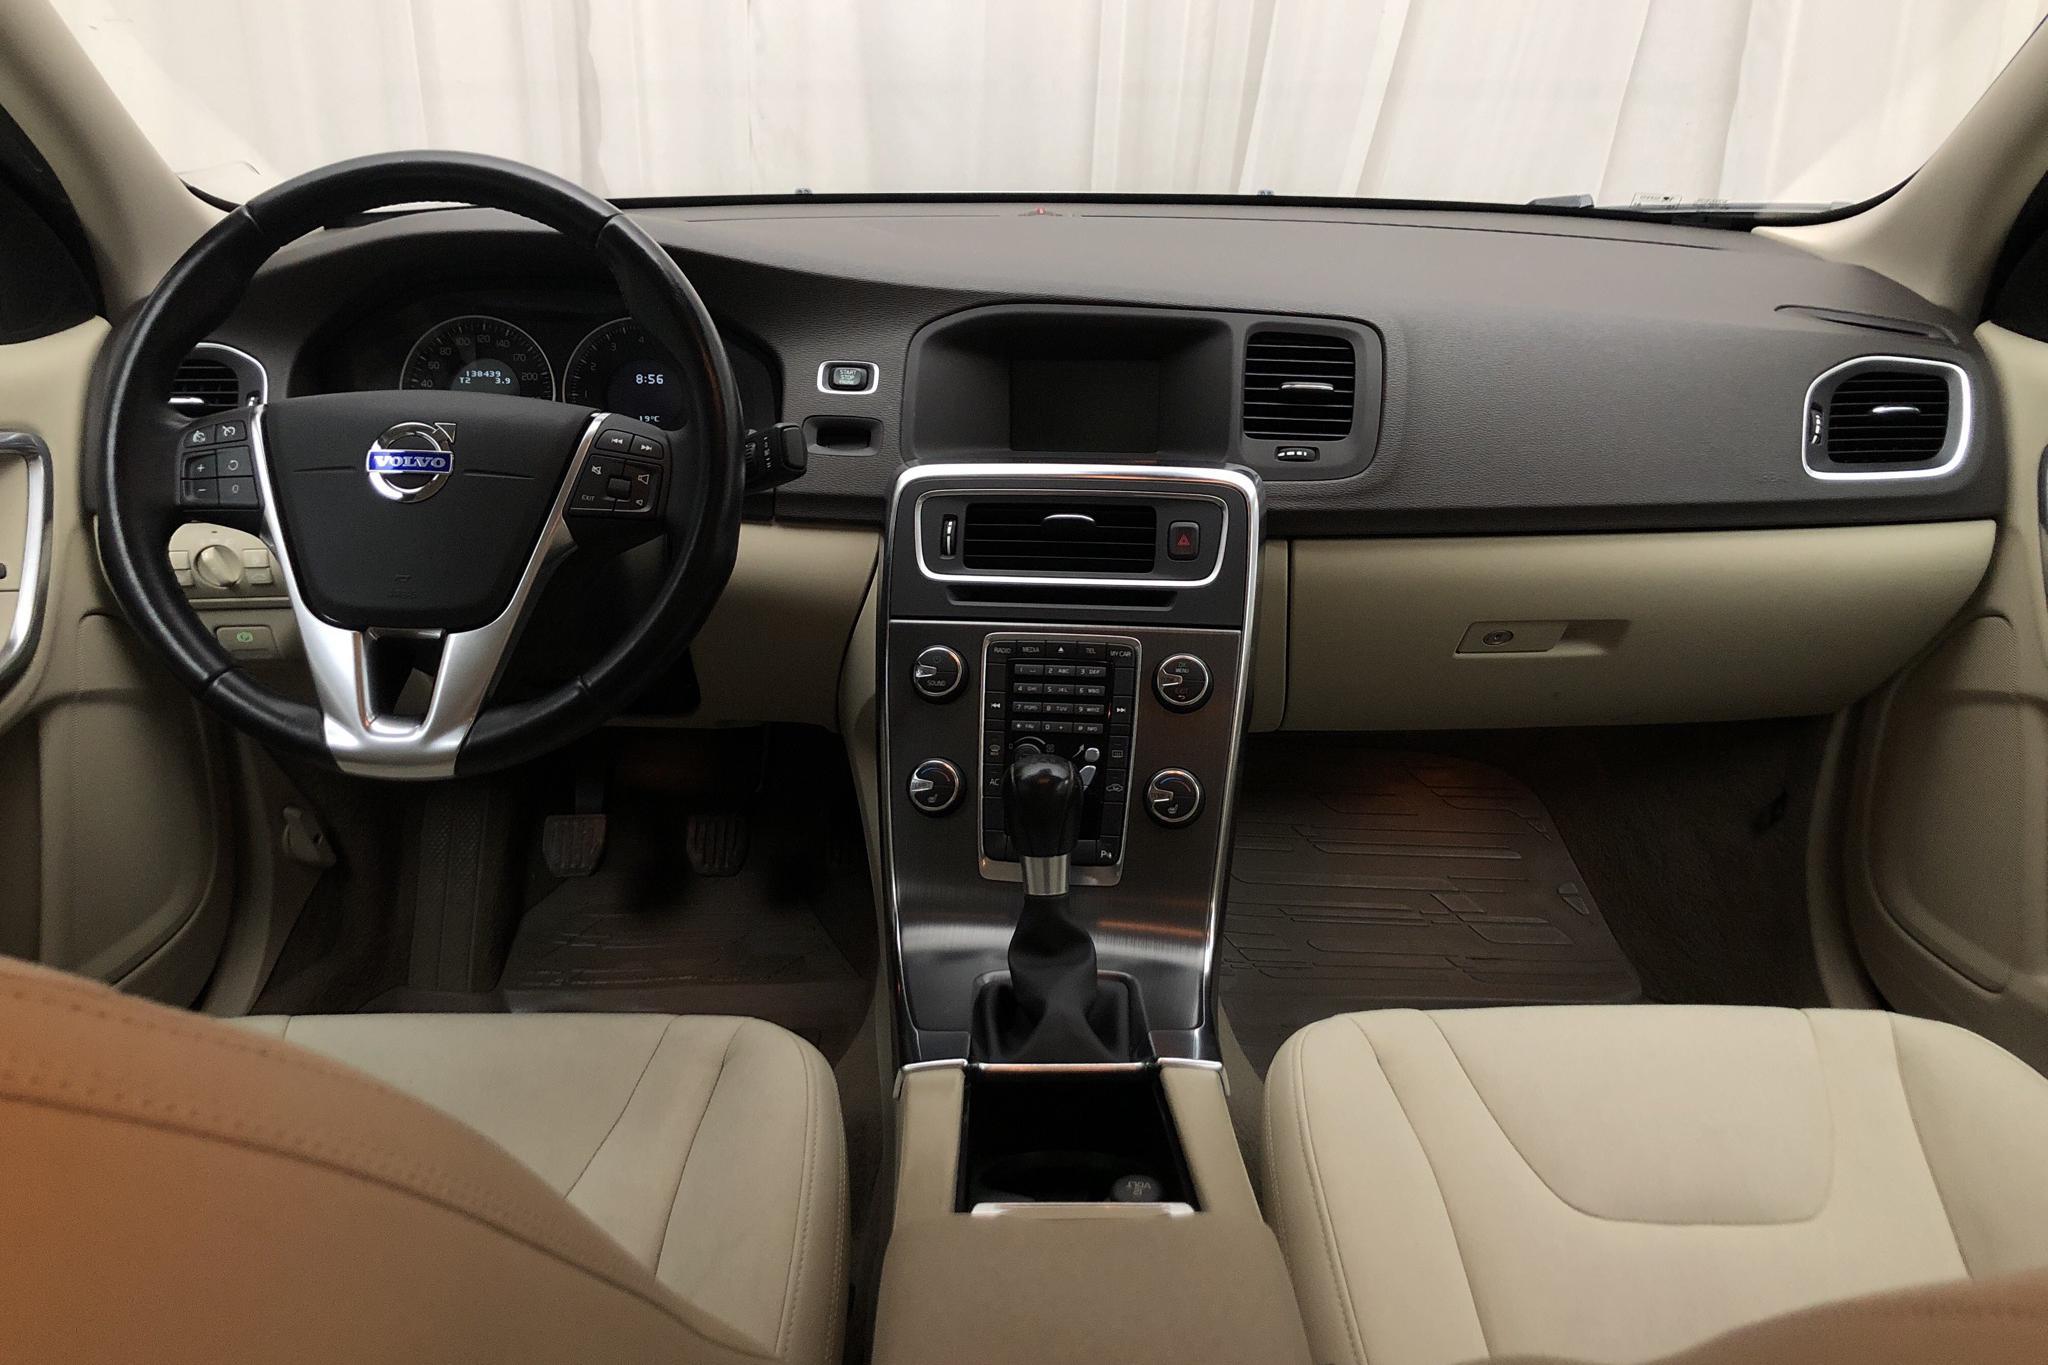 Volvo S60 T3 (150hk) - 13 843 mil - Manuell - vit - 2011